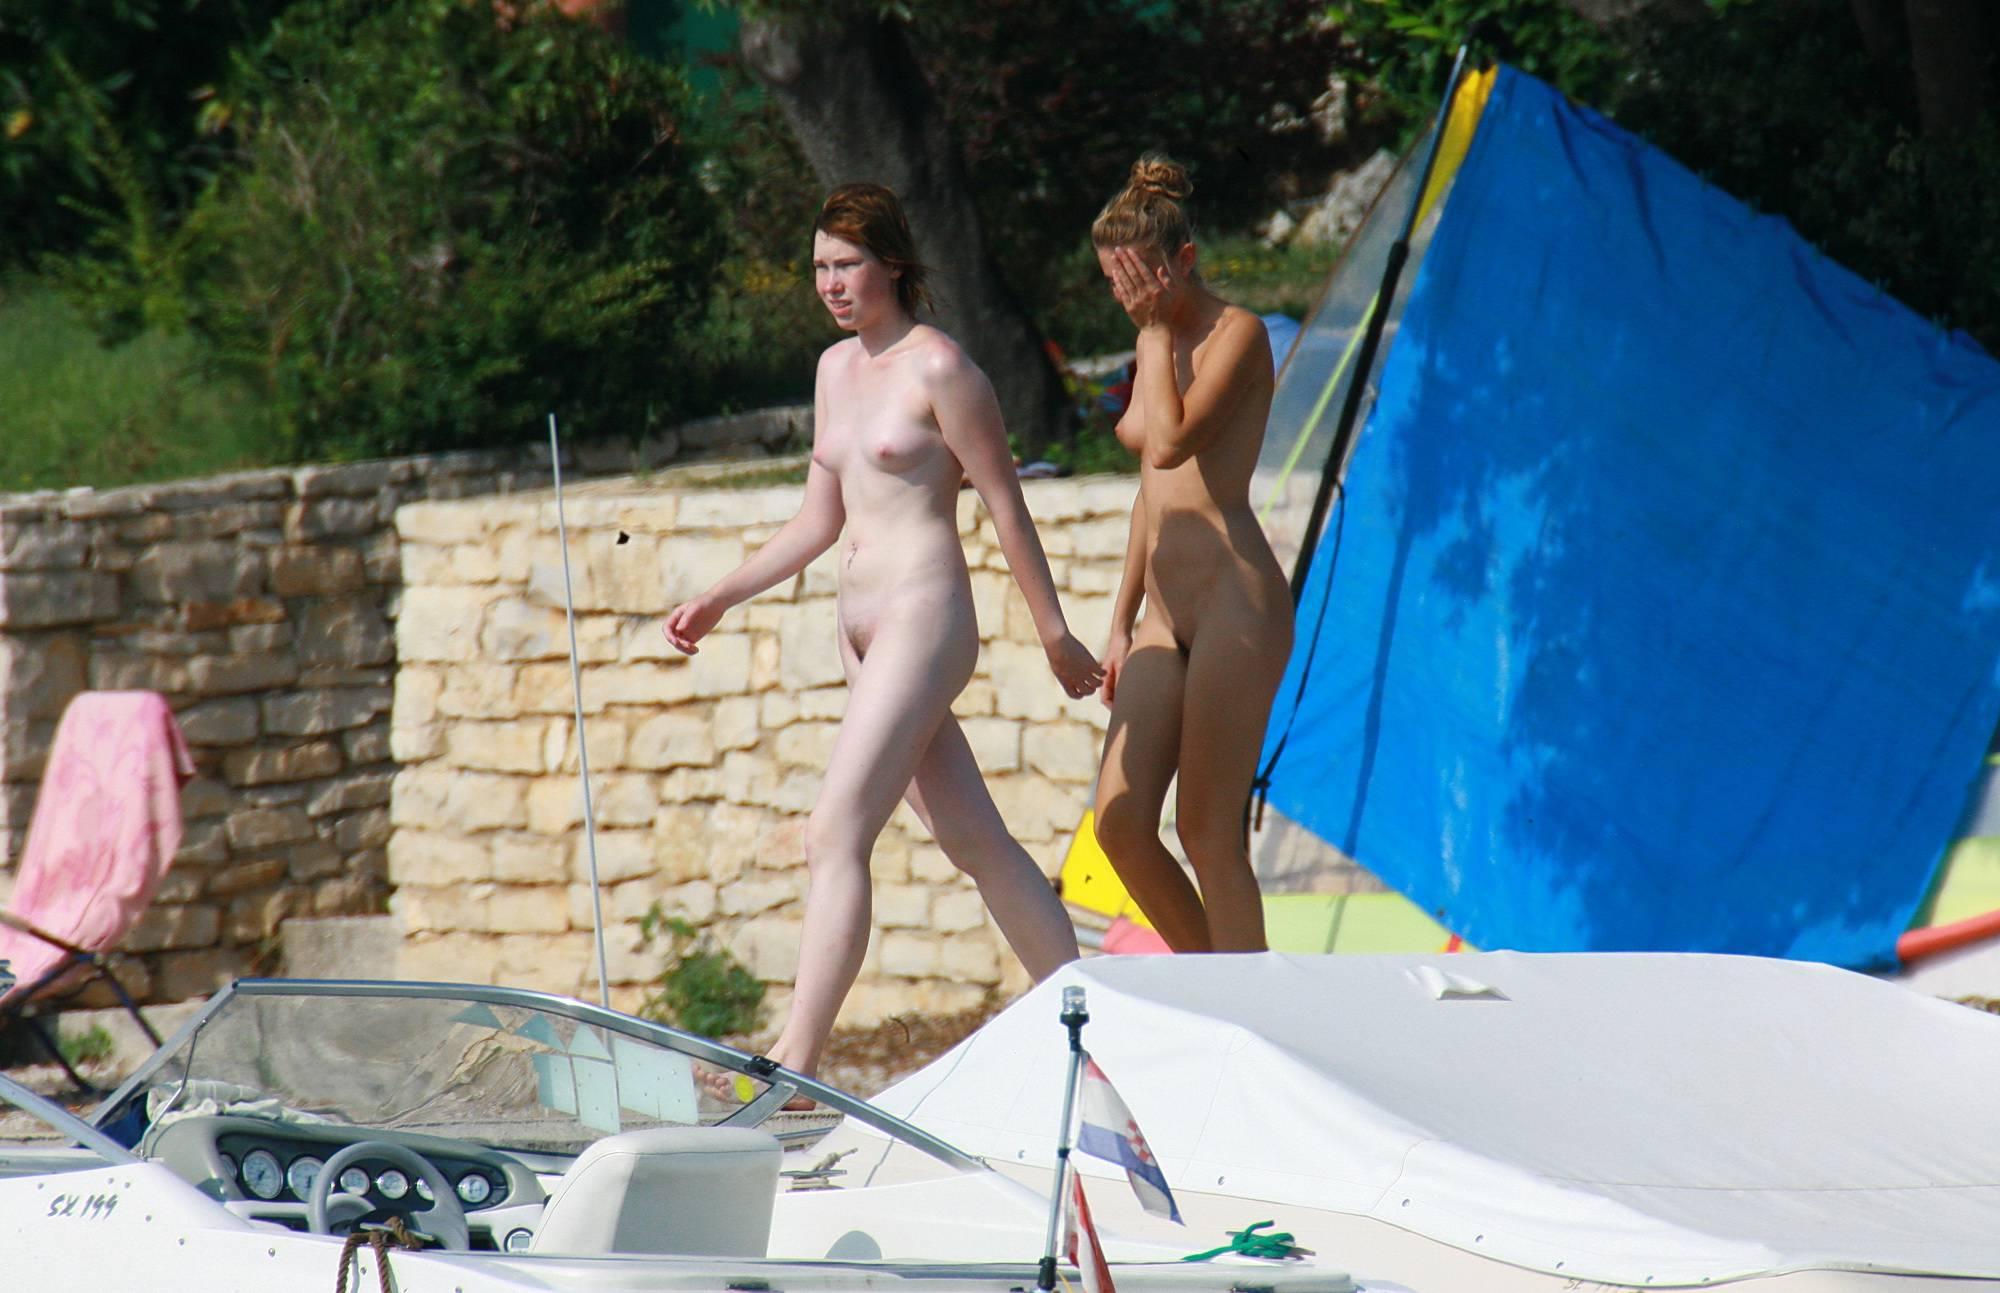 Nudist Photos Walking The Sea Ledge - 2